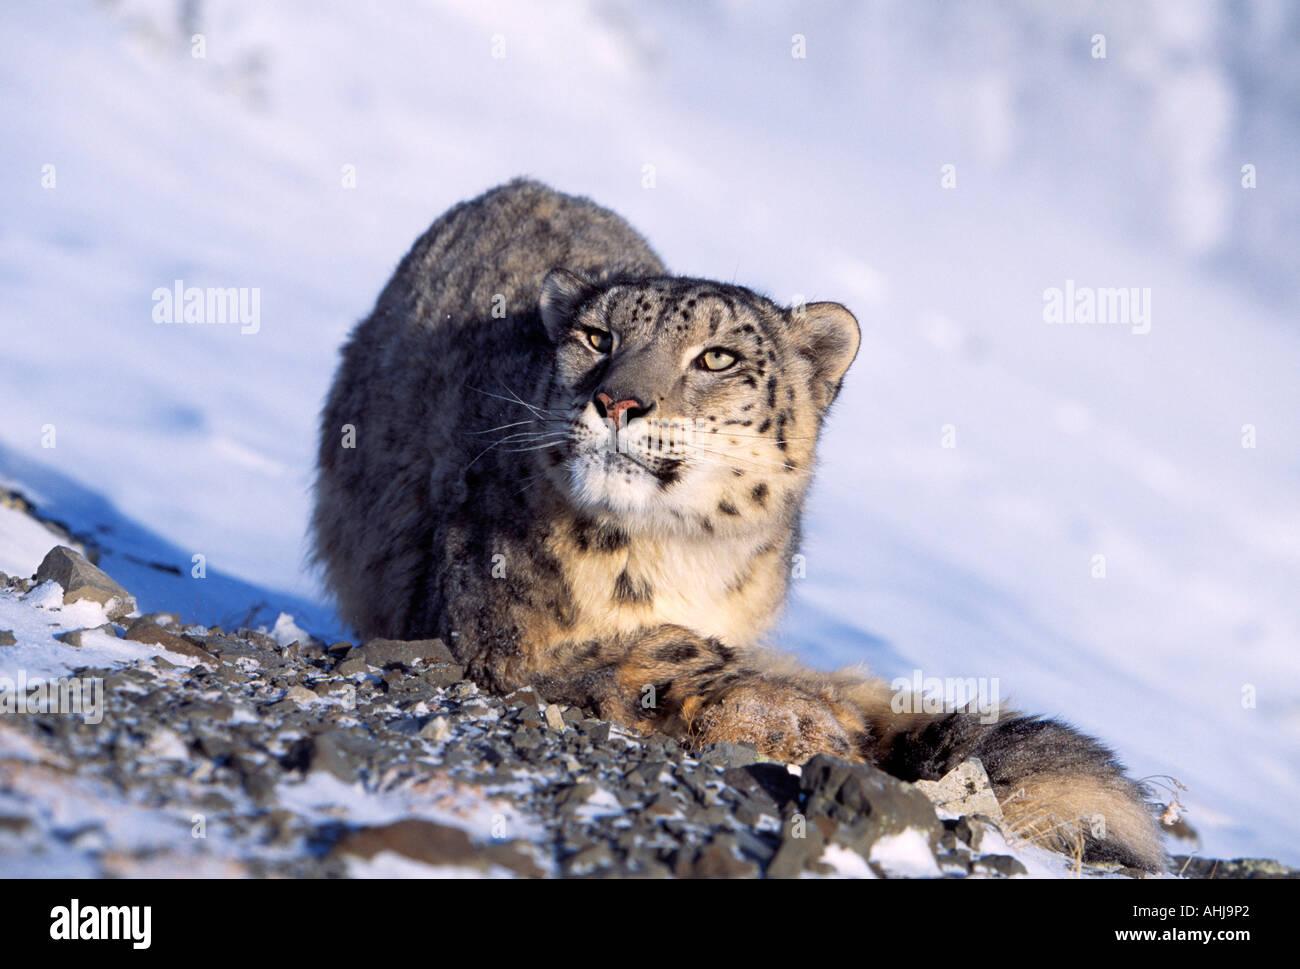 Snow leopard in snow - Stock Image